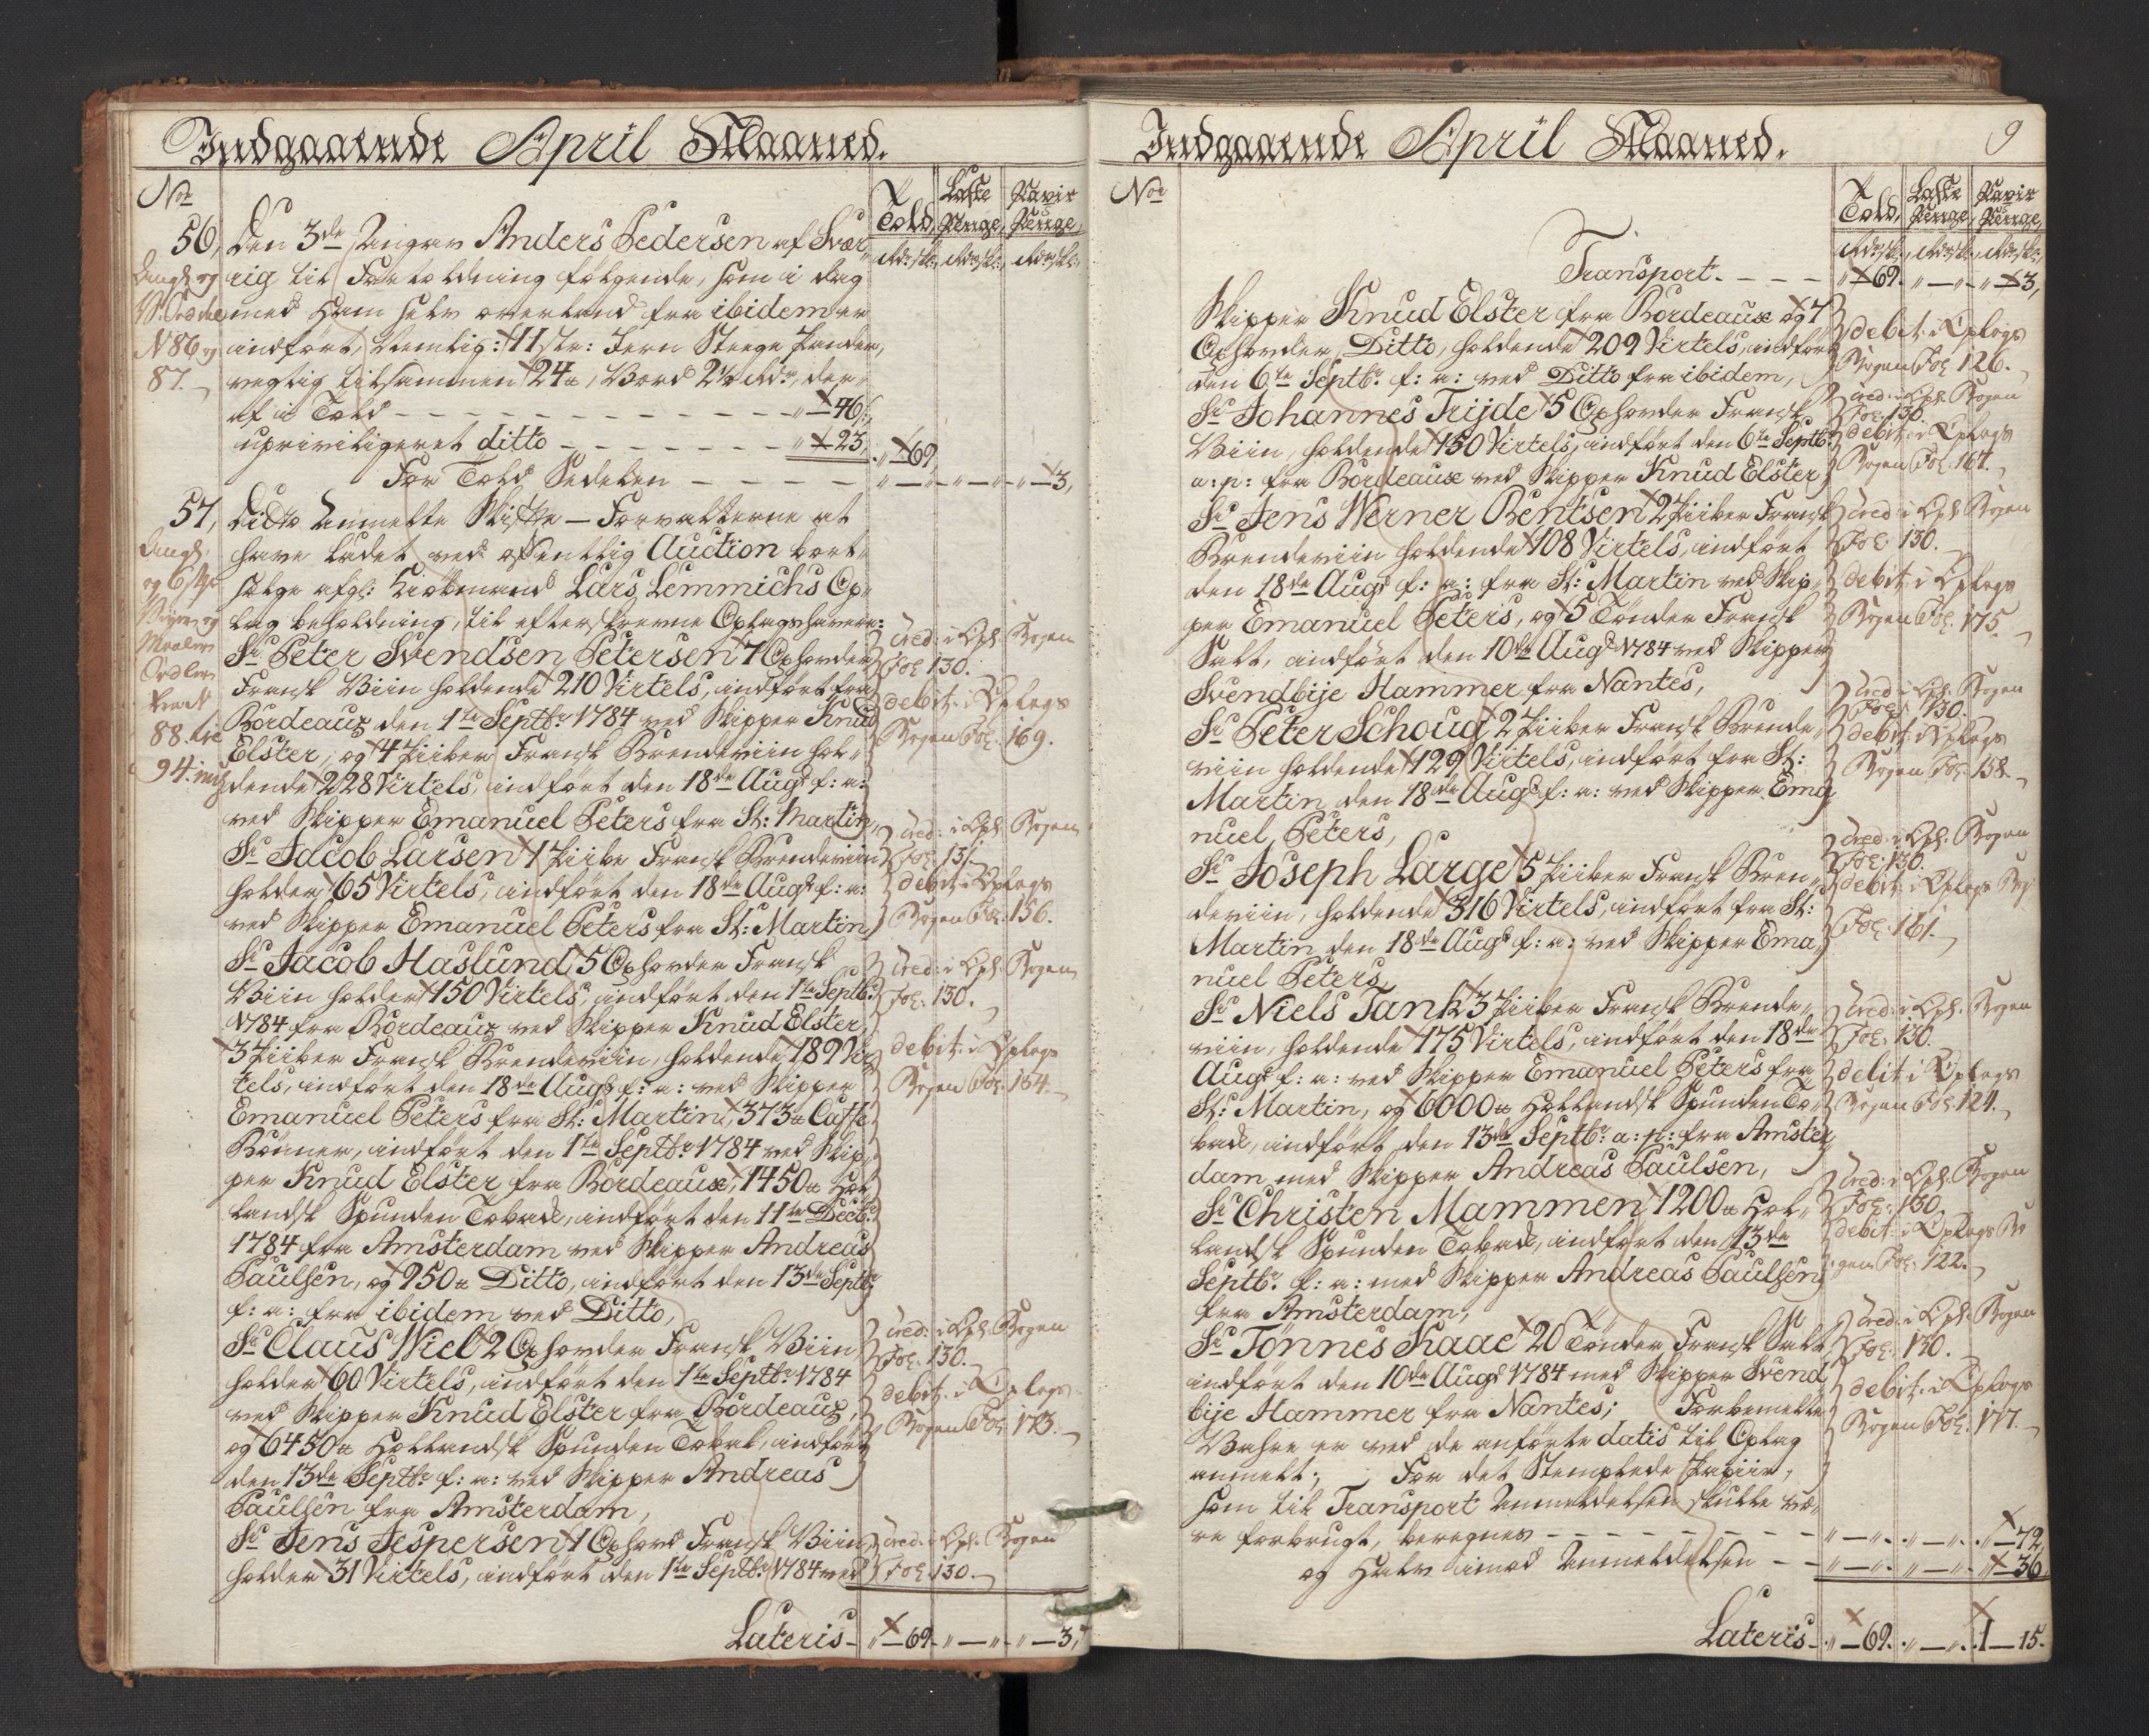 RA, Generaltollkammeret, tollregnskaper, R01/L0130: Tollregnskaper Fredrikshald, 1786, s. 8b-9a